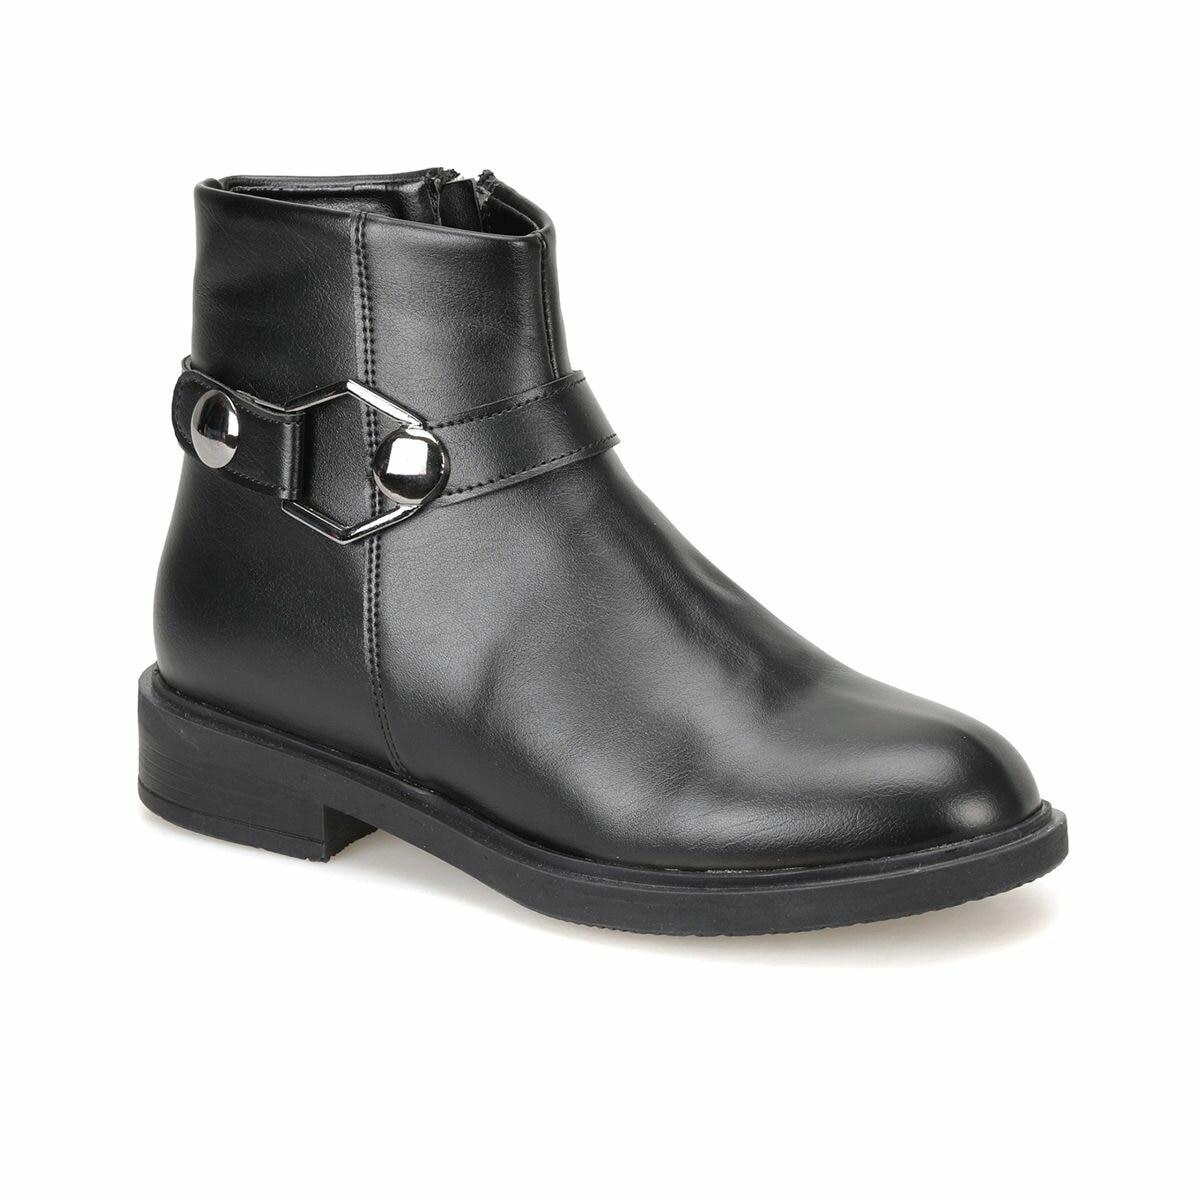 FLO 18K-240 Black Women Boots Miss F